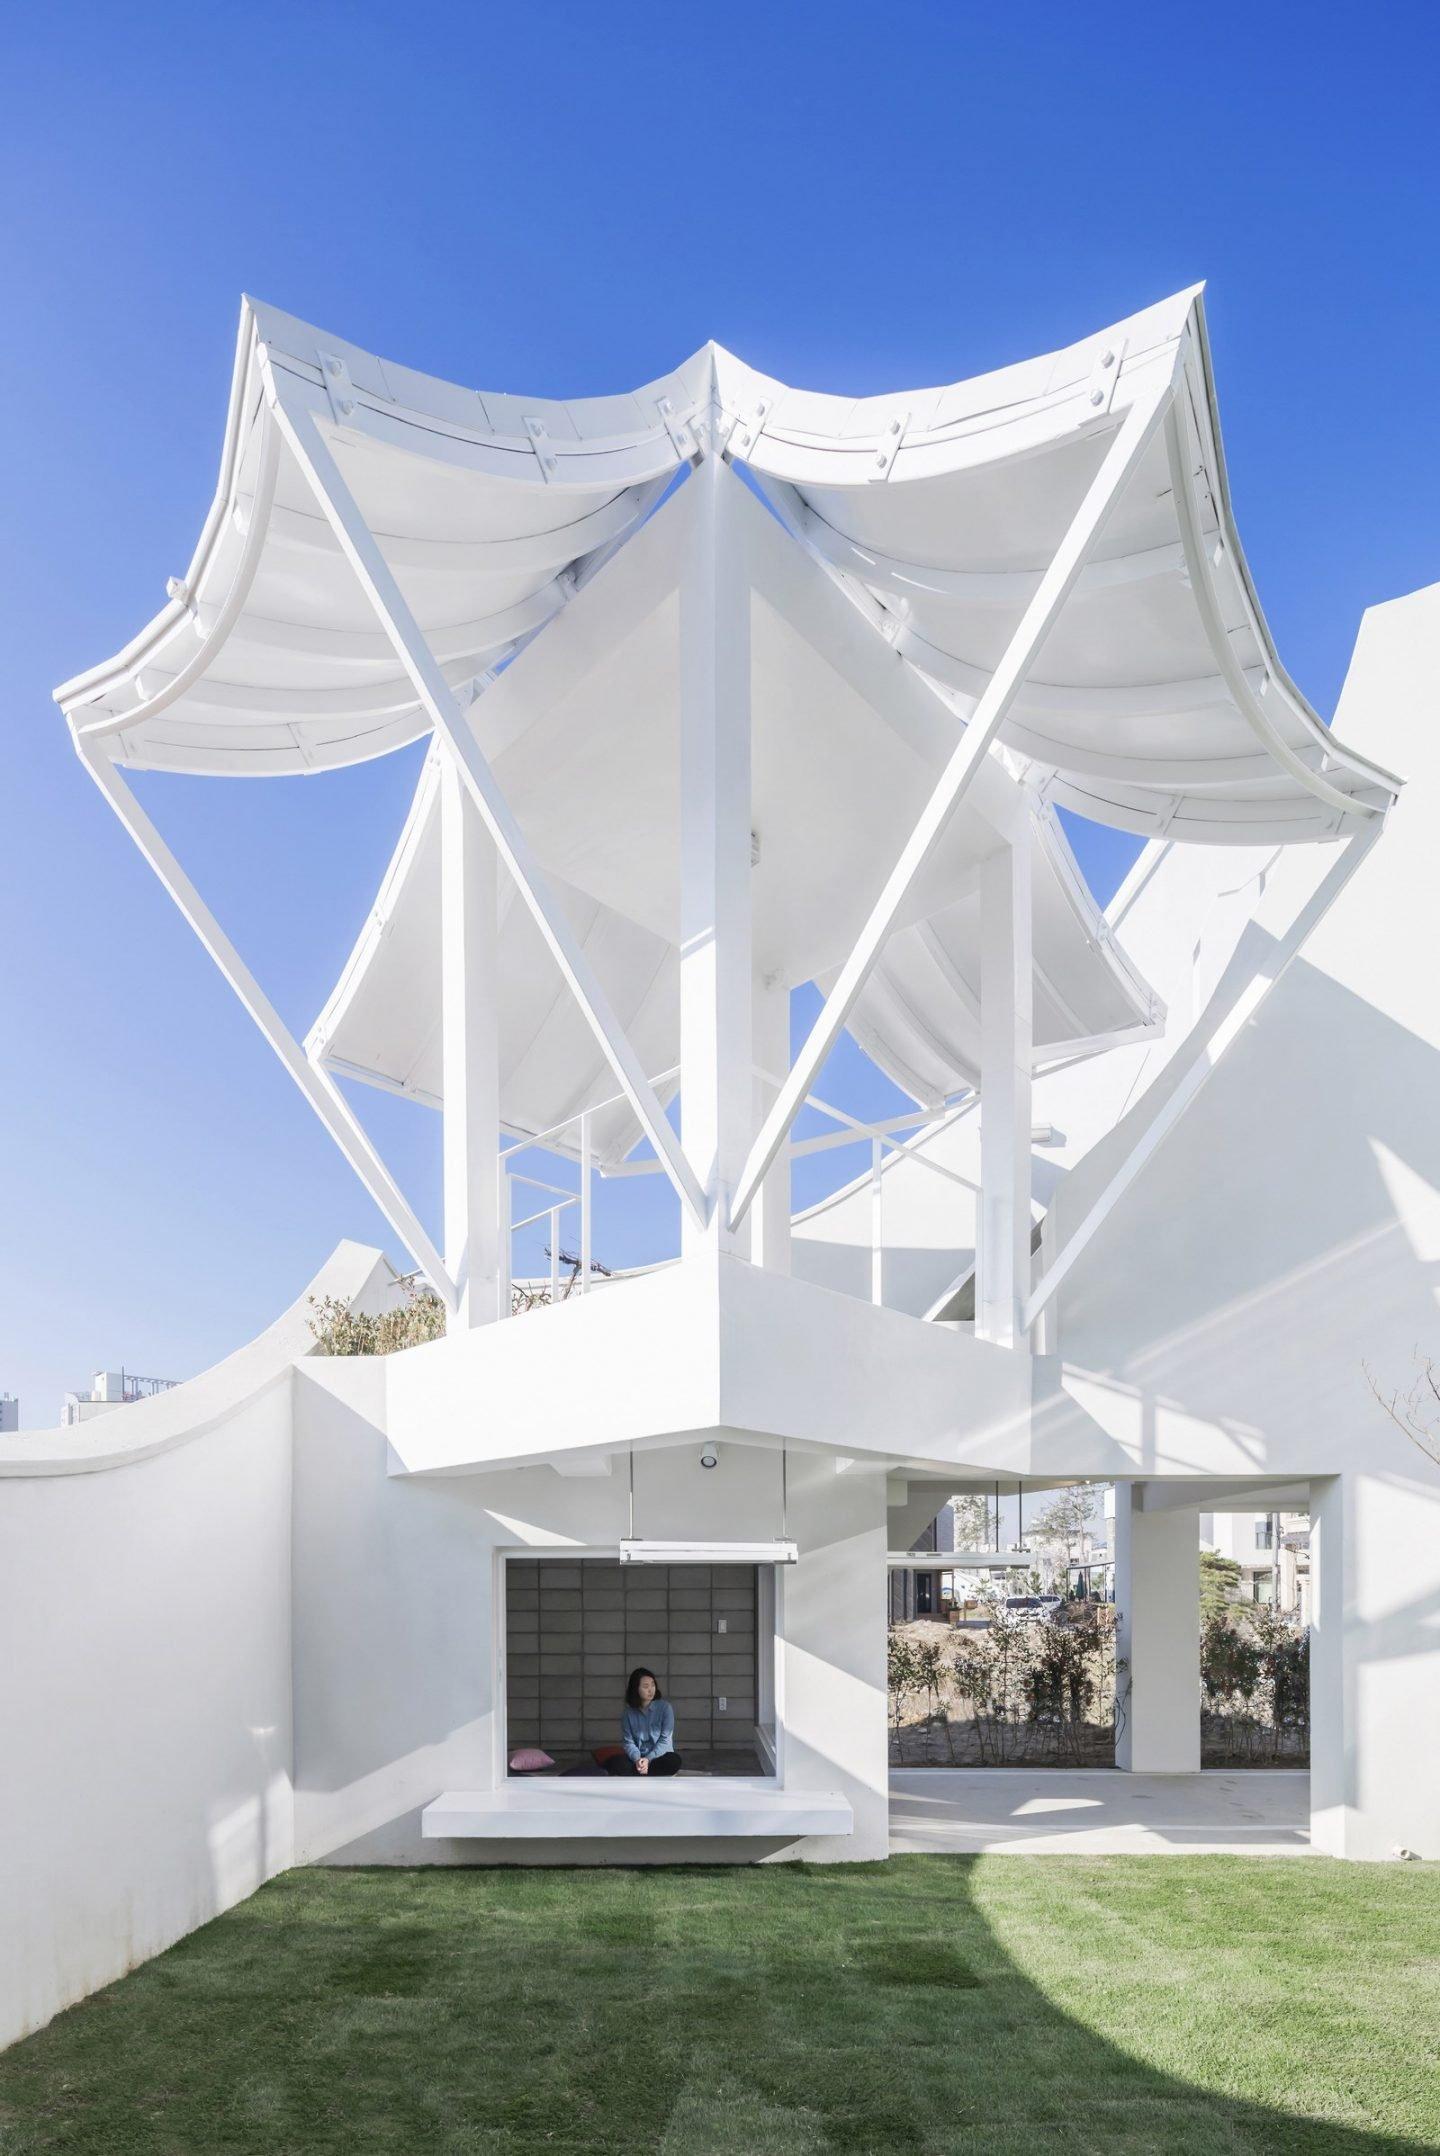 Iroje_KHM_Architecture (6)